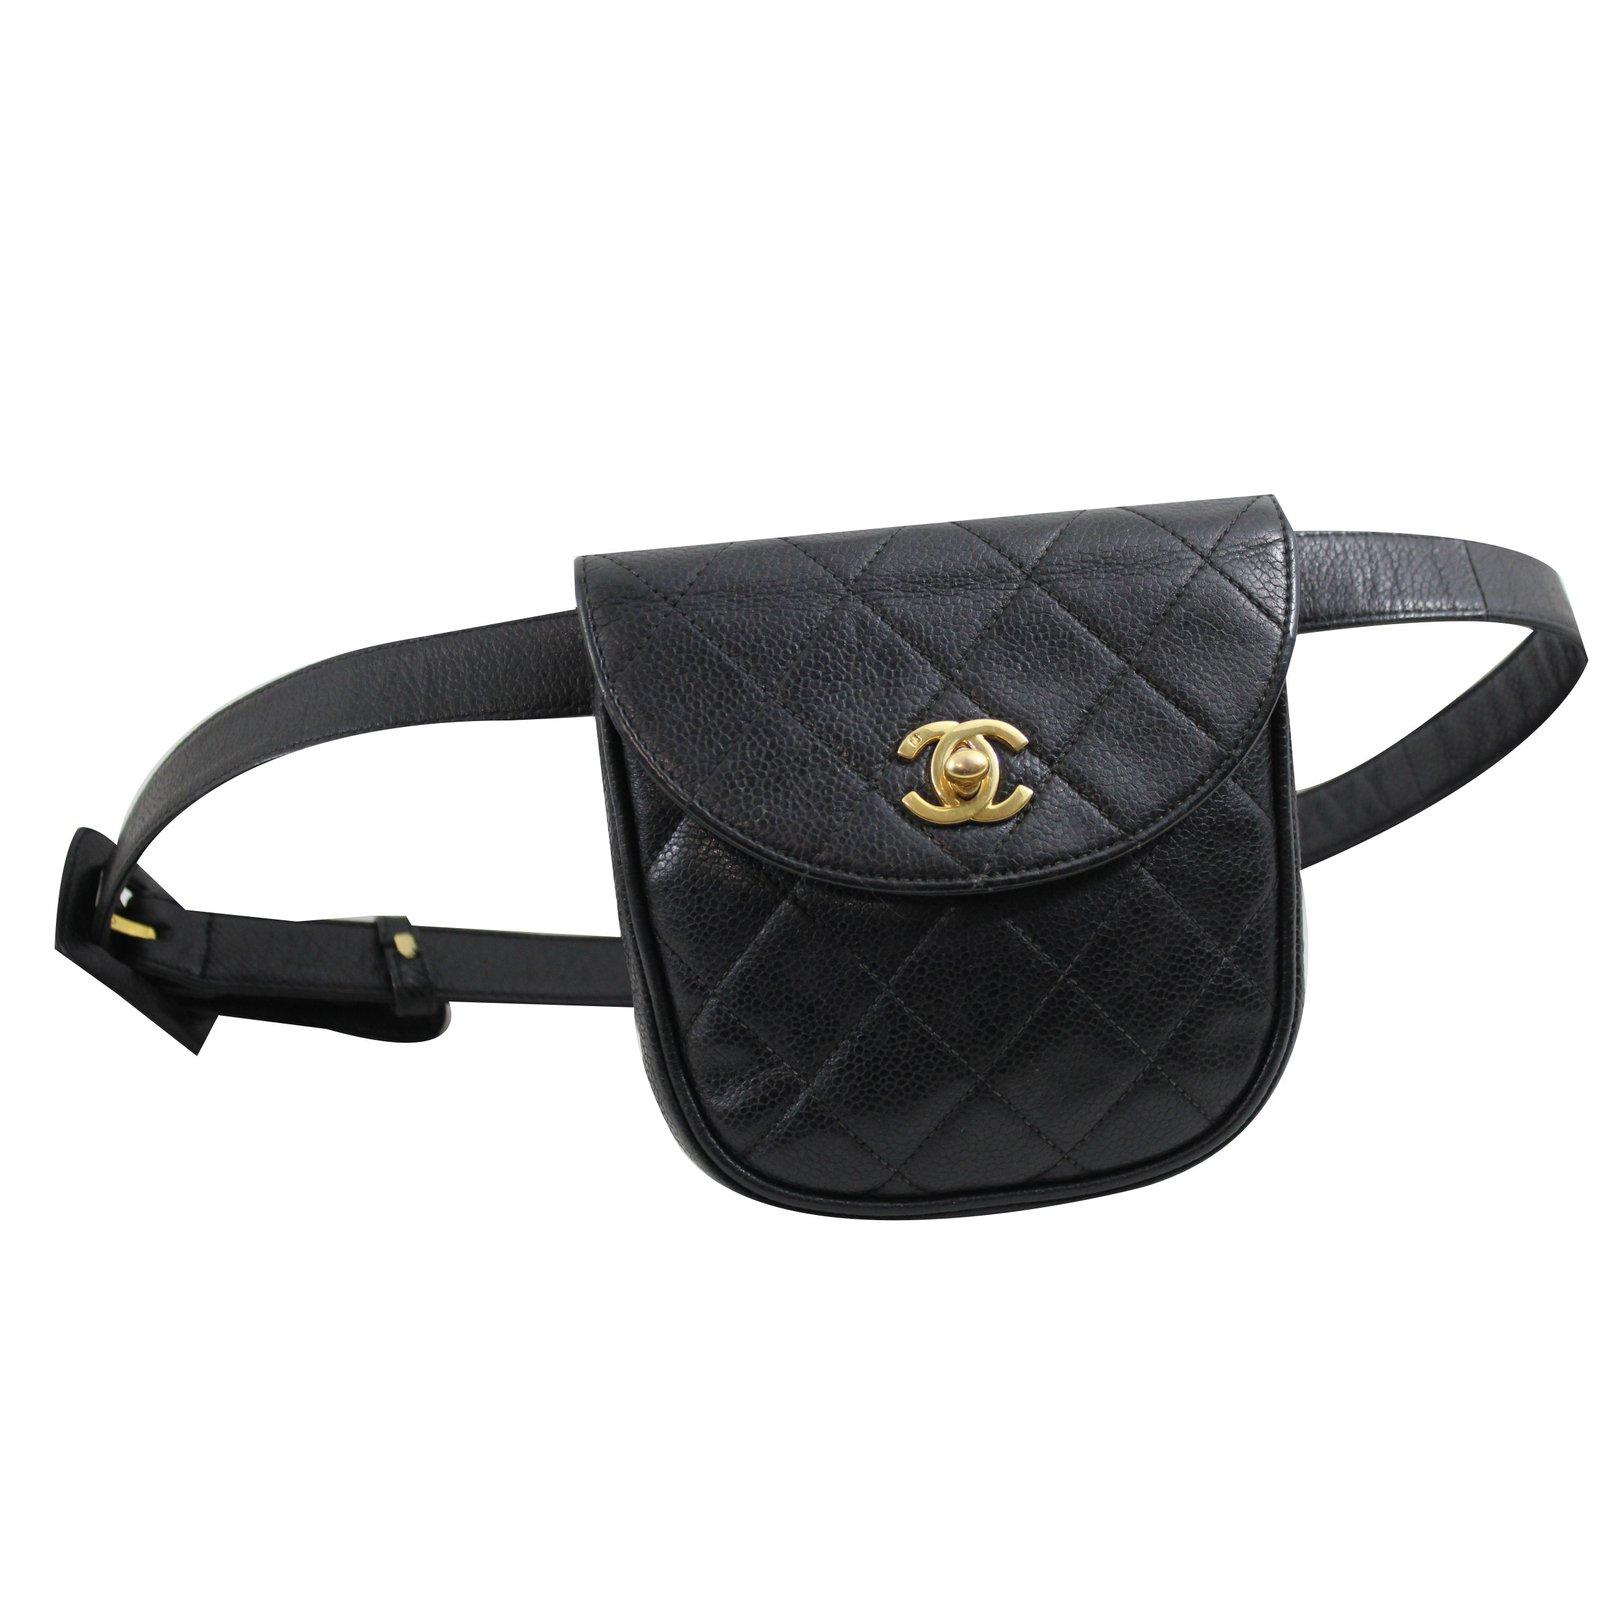 Pochettes Chanel Sac ceinture Cuir Noir ref.38278 - Joli Closet 3b240da1afd